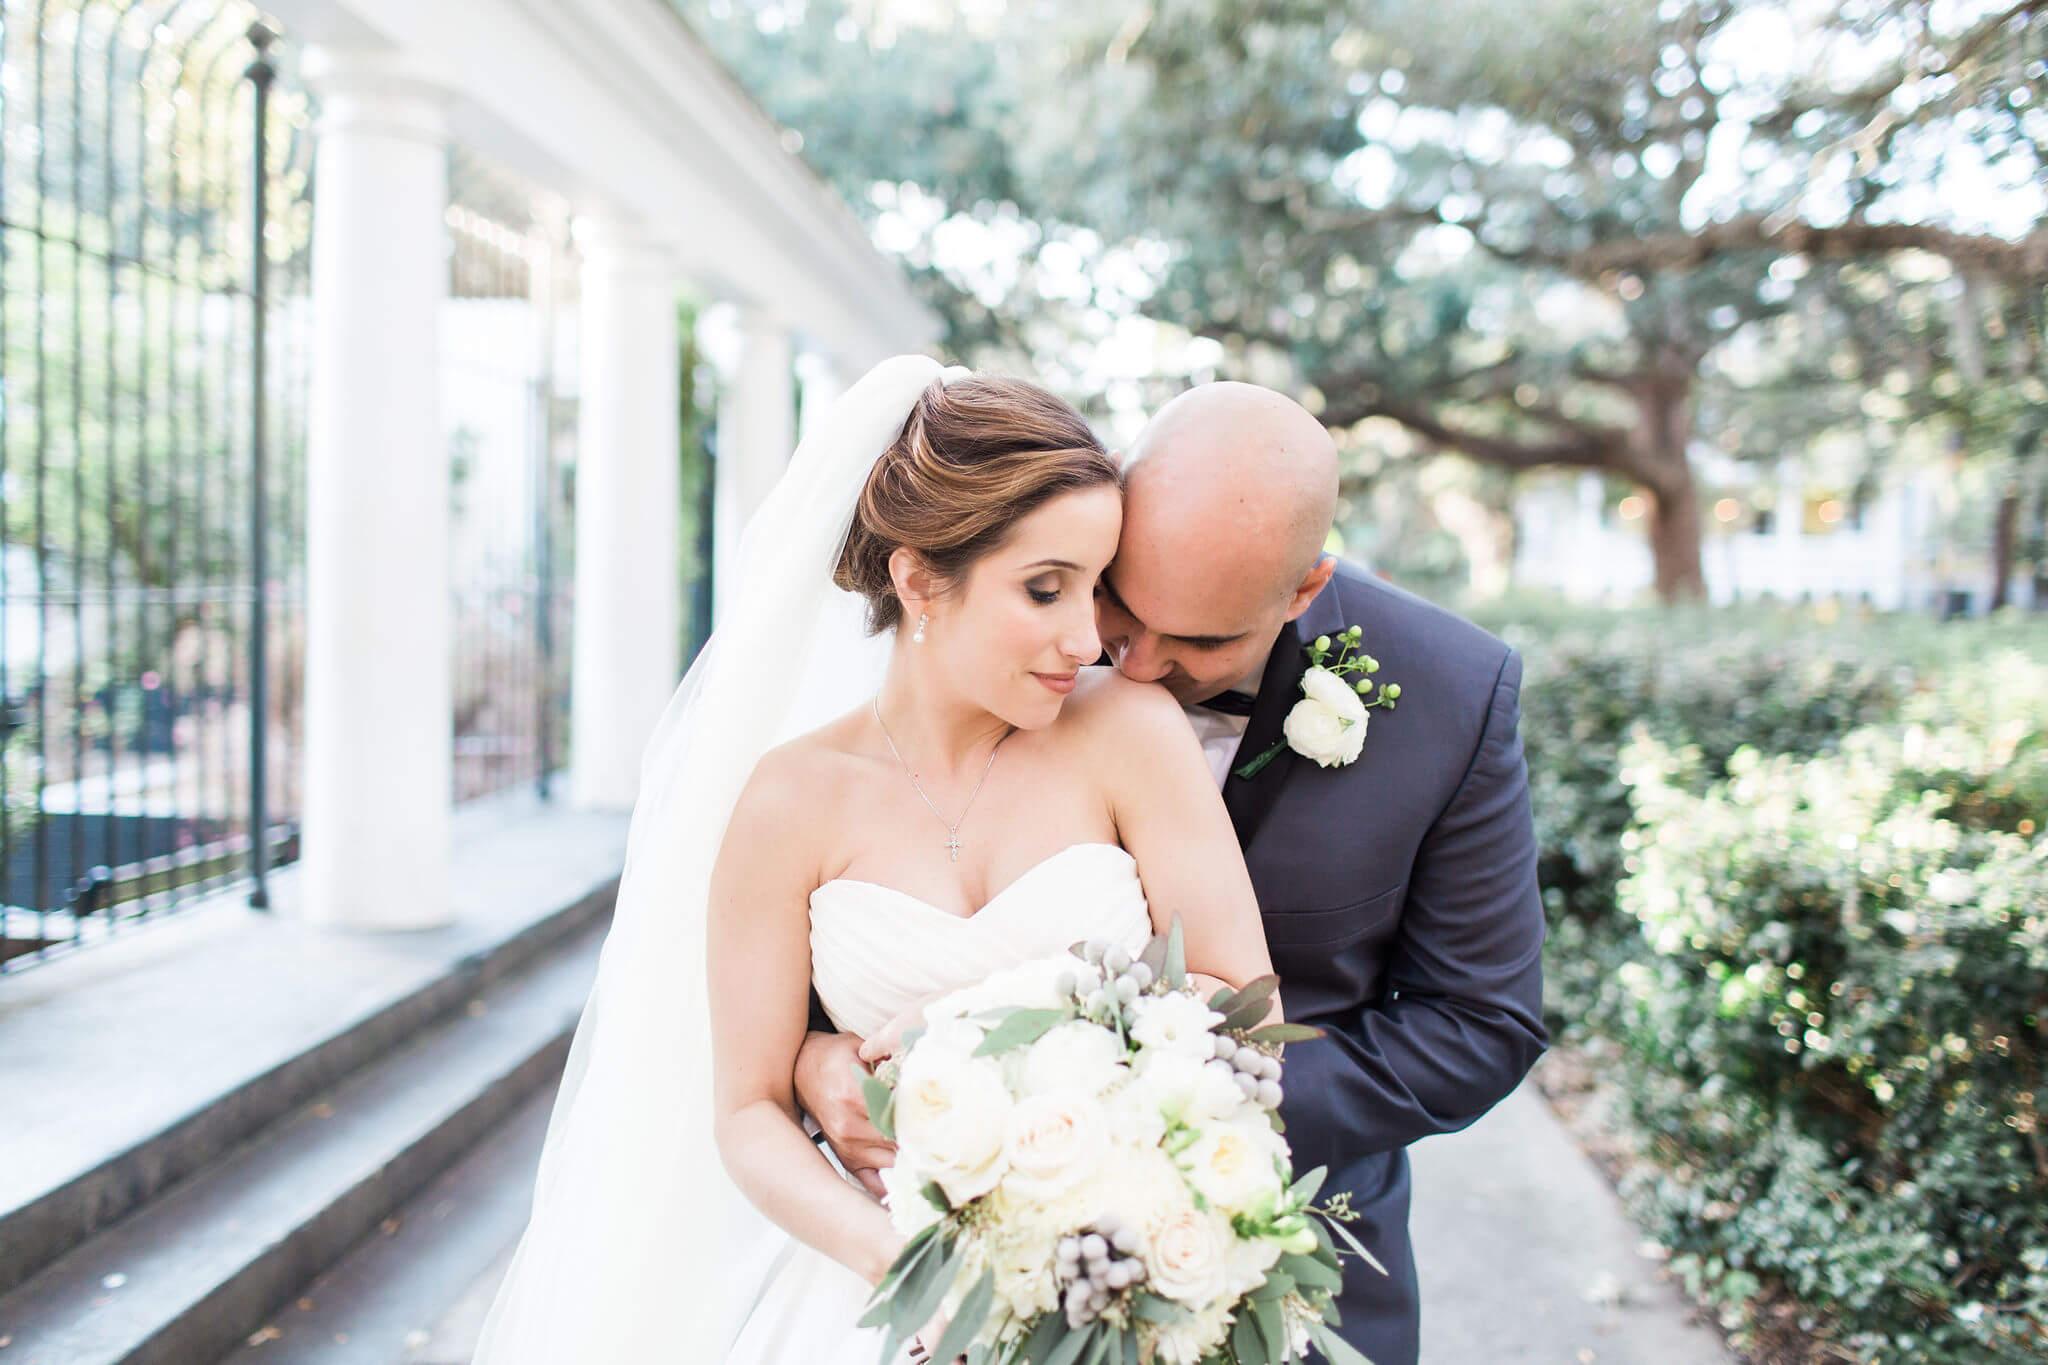 apt-b-photography-savannah-wedding-photographer-savannah-wedding-forsyth-park-elopement-intimate-wedding-photographer-82.JPG